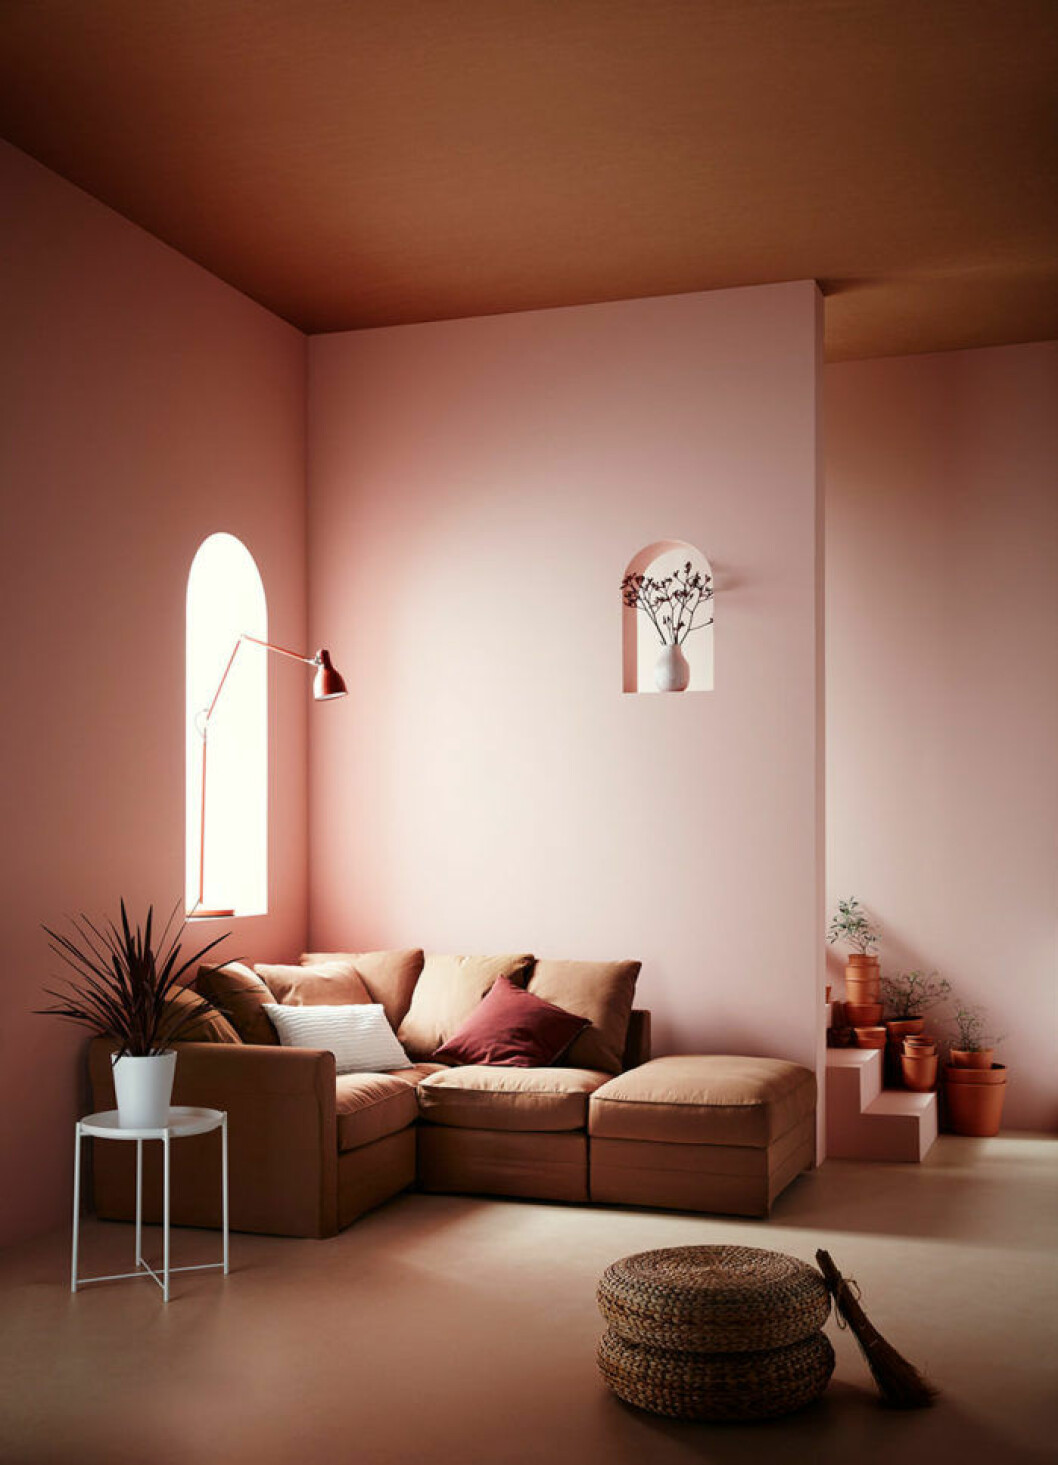 Ikea-katalogen 2019 rosa rost